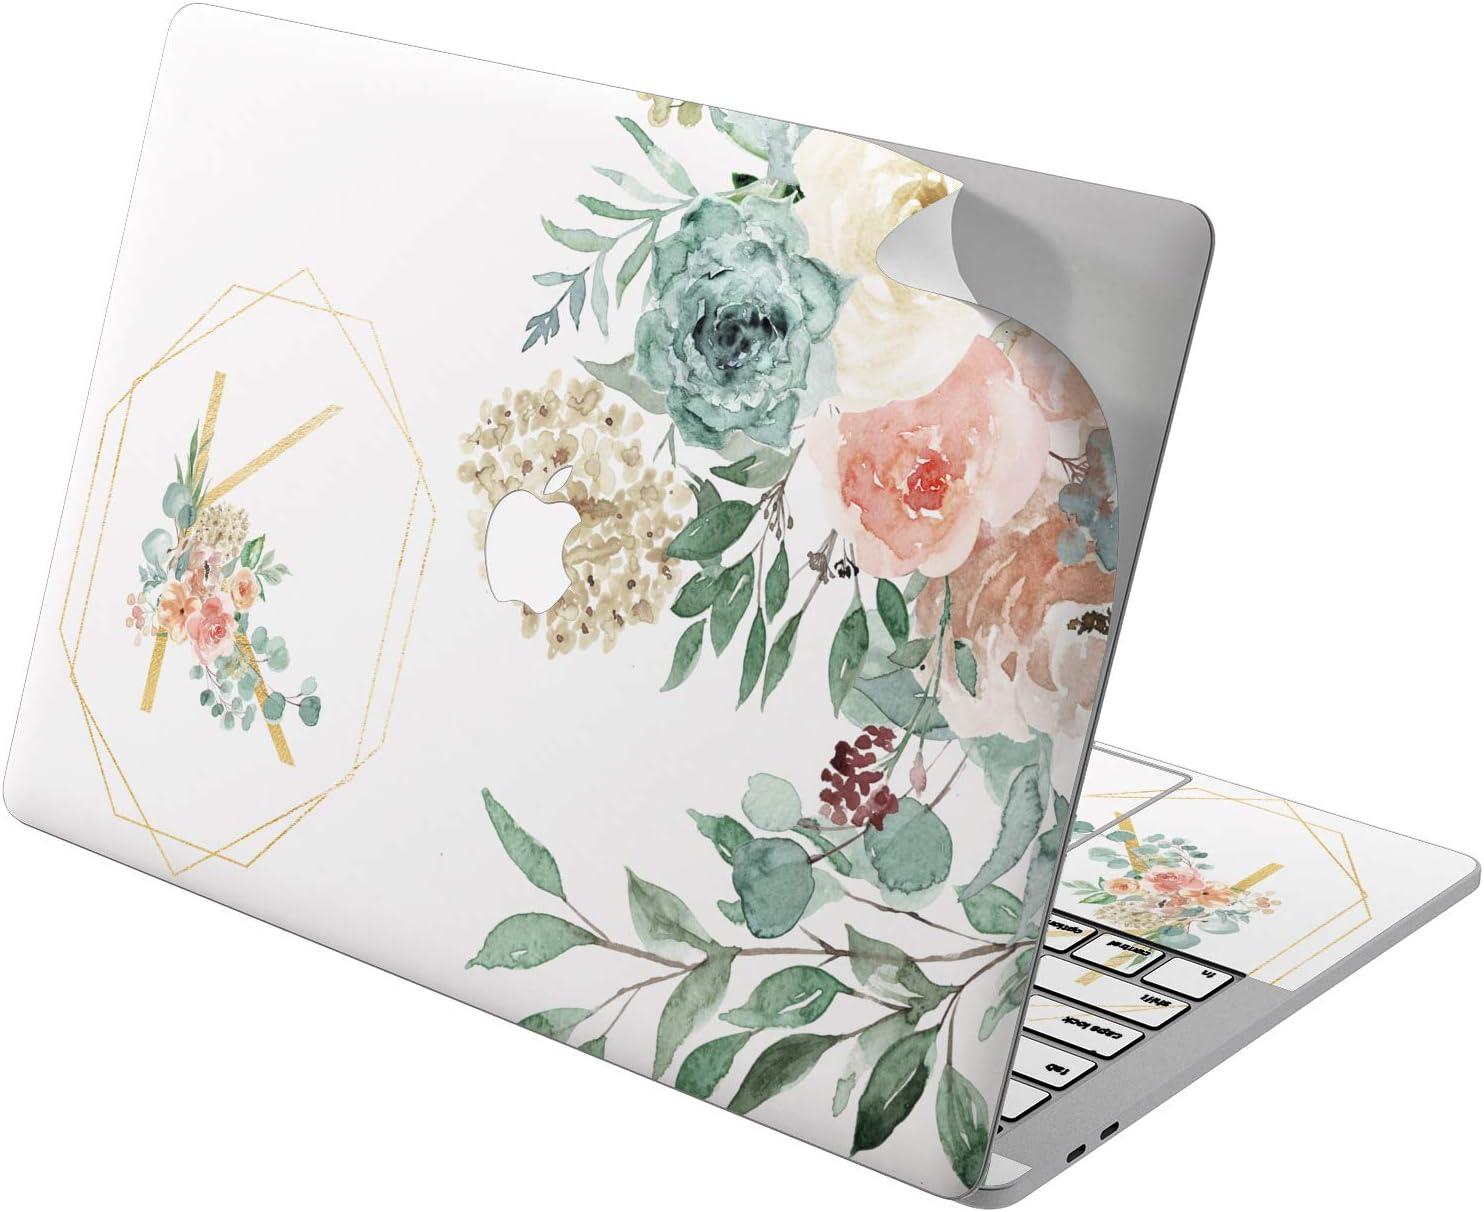 "Cavka Vinyl Decal Skin for Apple MacBook Pro 13"" 2019 15"" 2018 Air 13"" 2020 Retina 2015 Mac 11"" Mac 12"" Sticker Watercolor Peonies Cover Design Laptop Flowers Print Name Monogram Protective Custom"